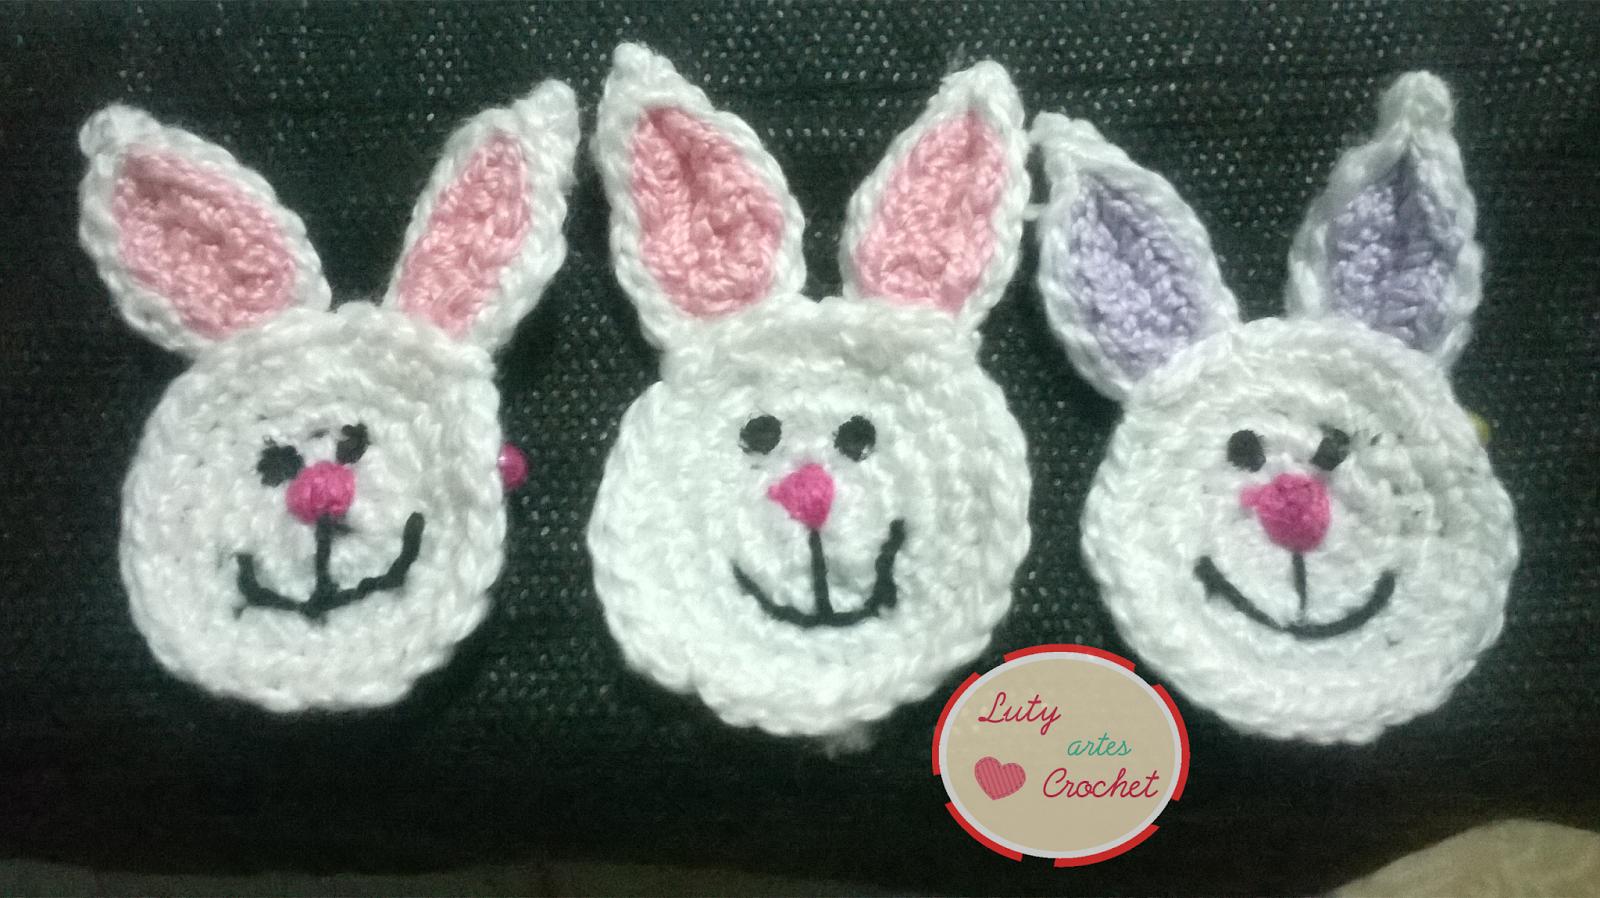 Luty Artes Crochet: Meus trabalhos